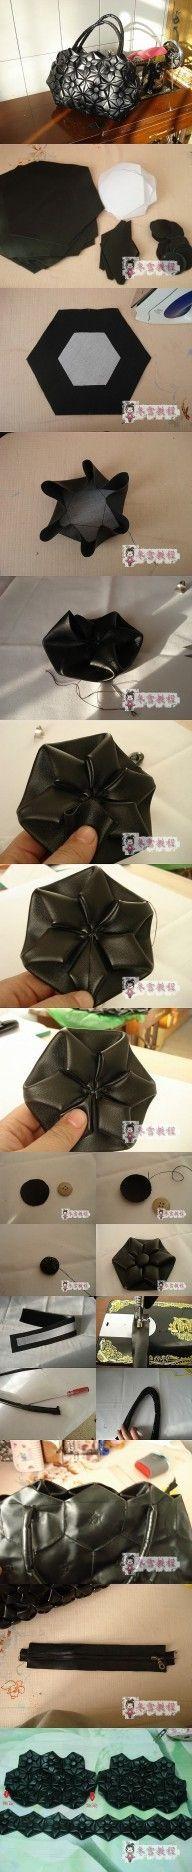 DIY Beautiful Fashion Handbag DIY Projects